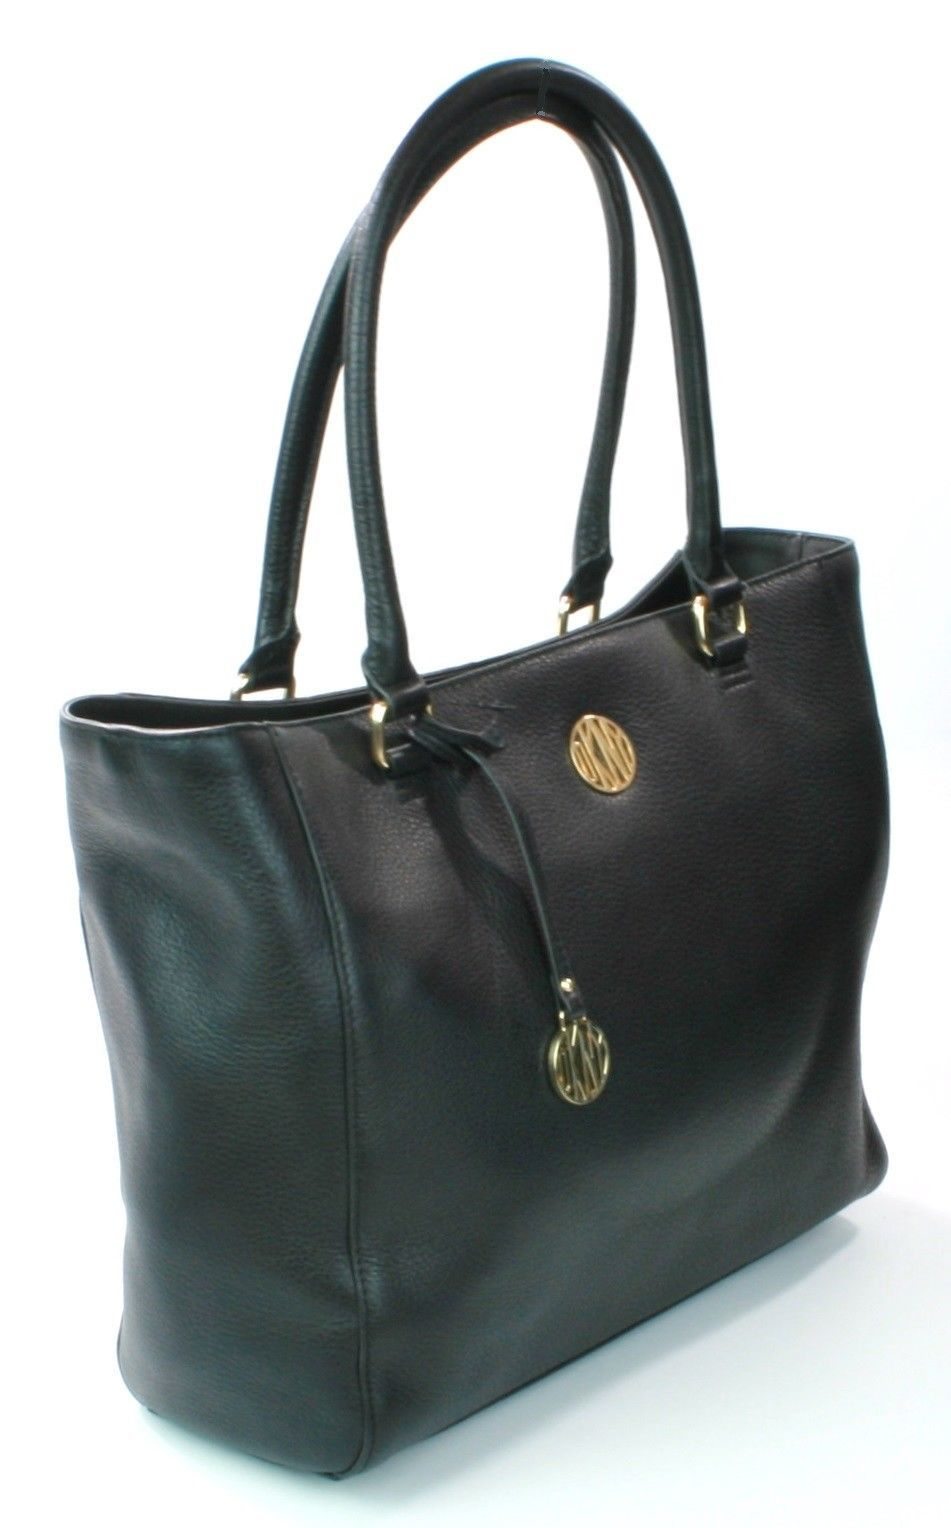 Donna Karan DKNY Black Leather Large Tote Shopper Bag Handbag large